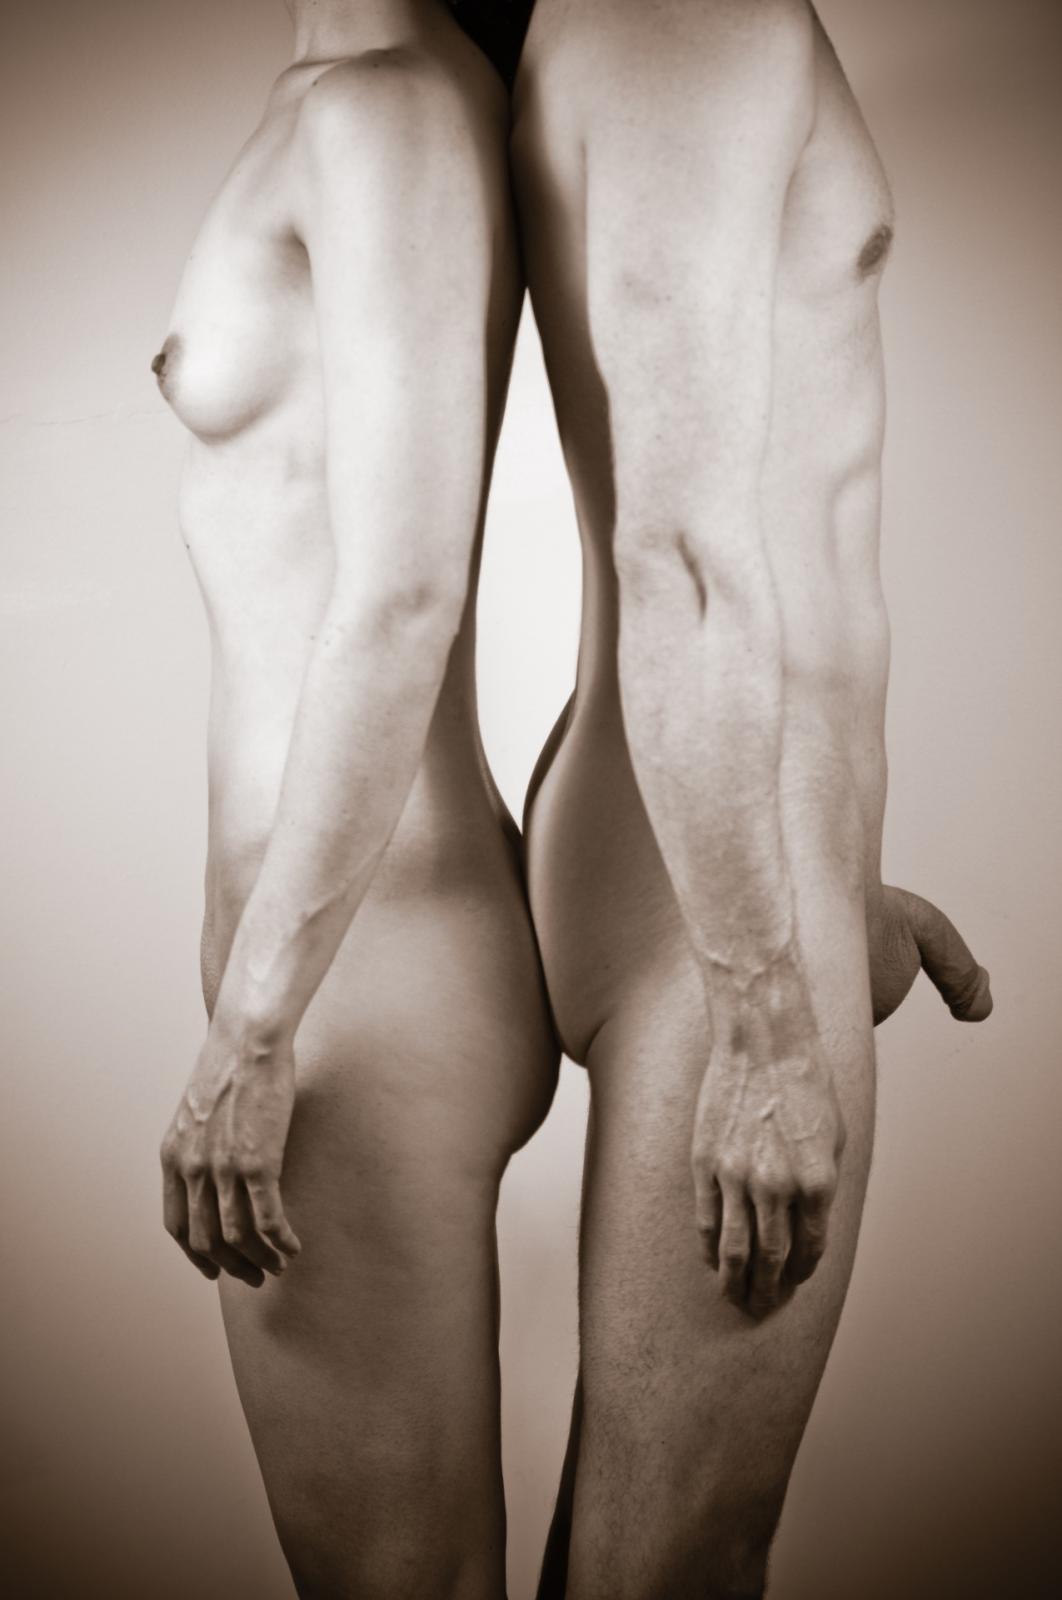 Mature Loving Couples Having Sex